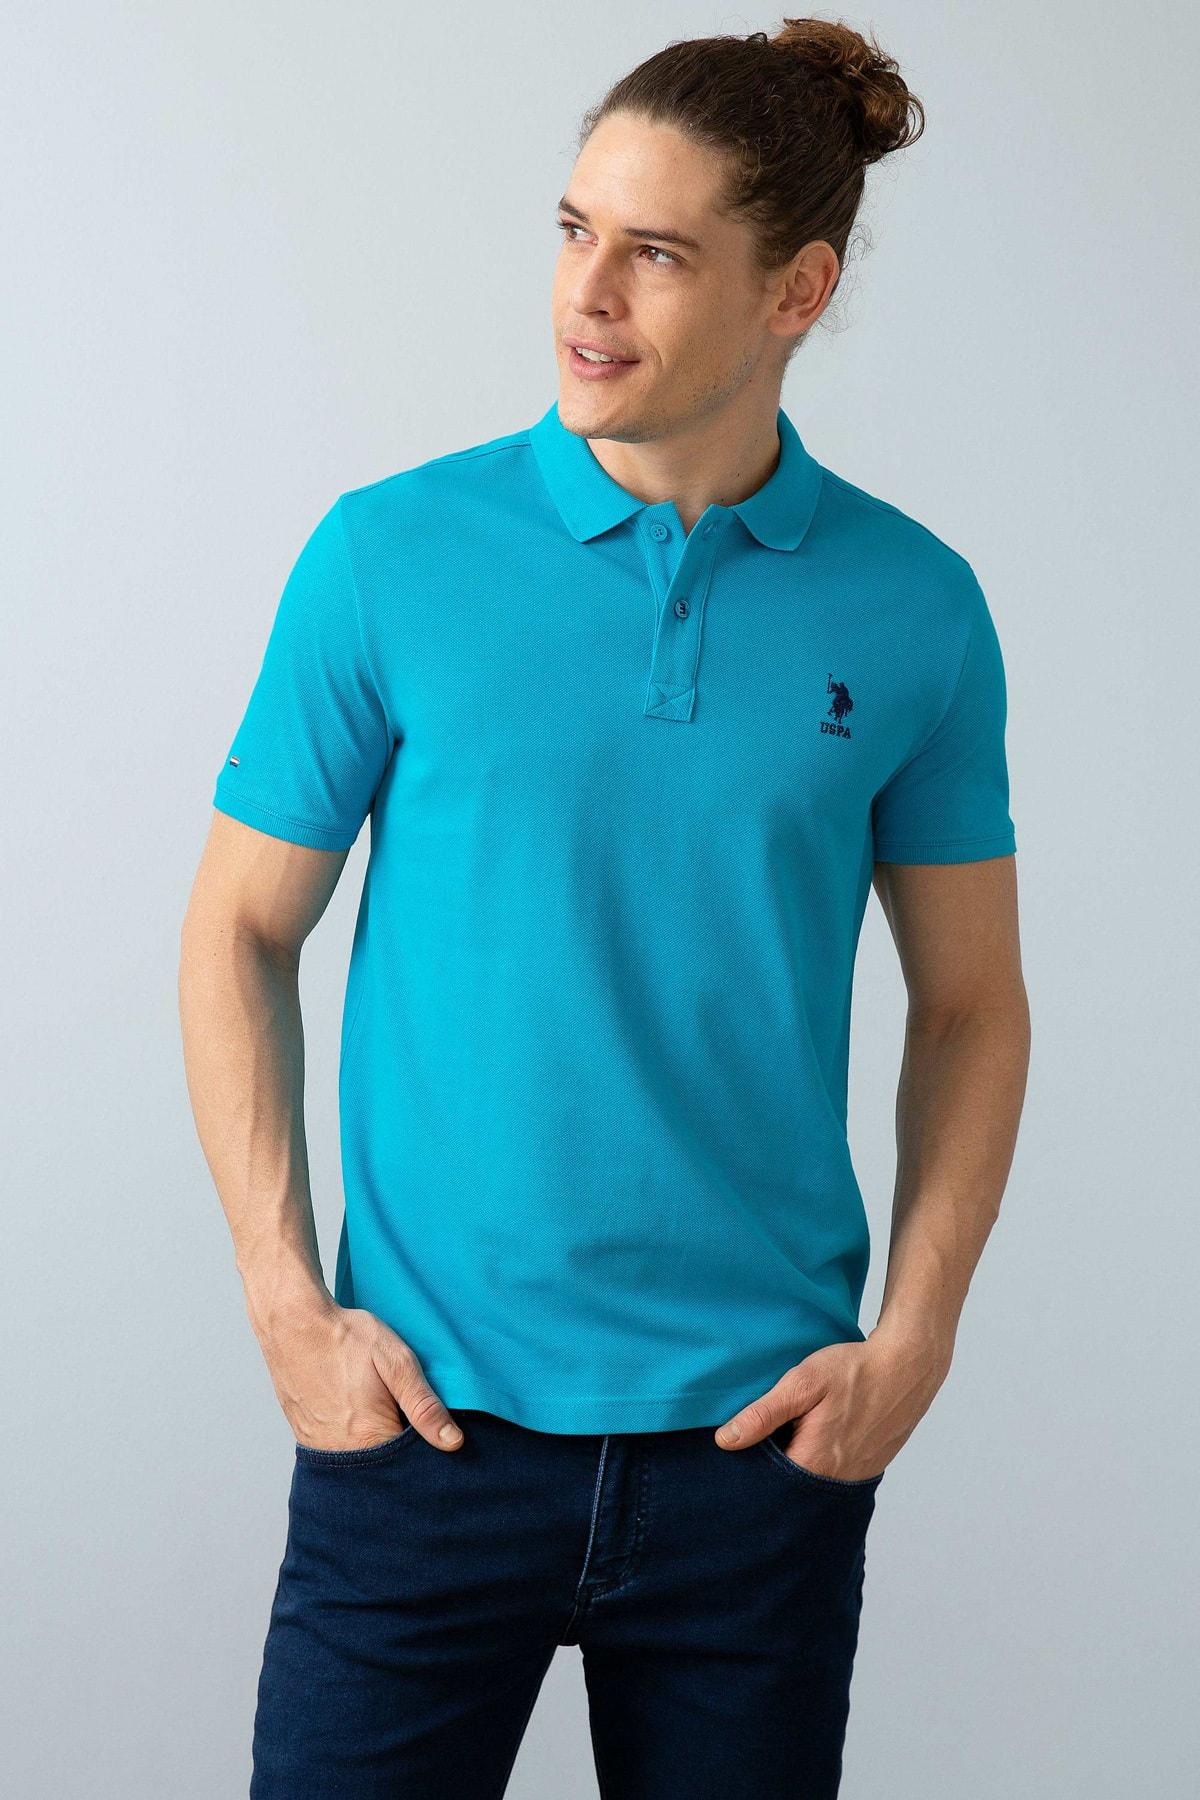 U.S. Polo Assn. Erkek Polo Yaka T-Shirt G081SZ011.000.739348 1